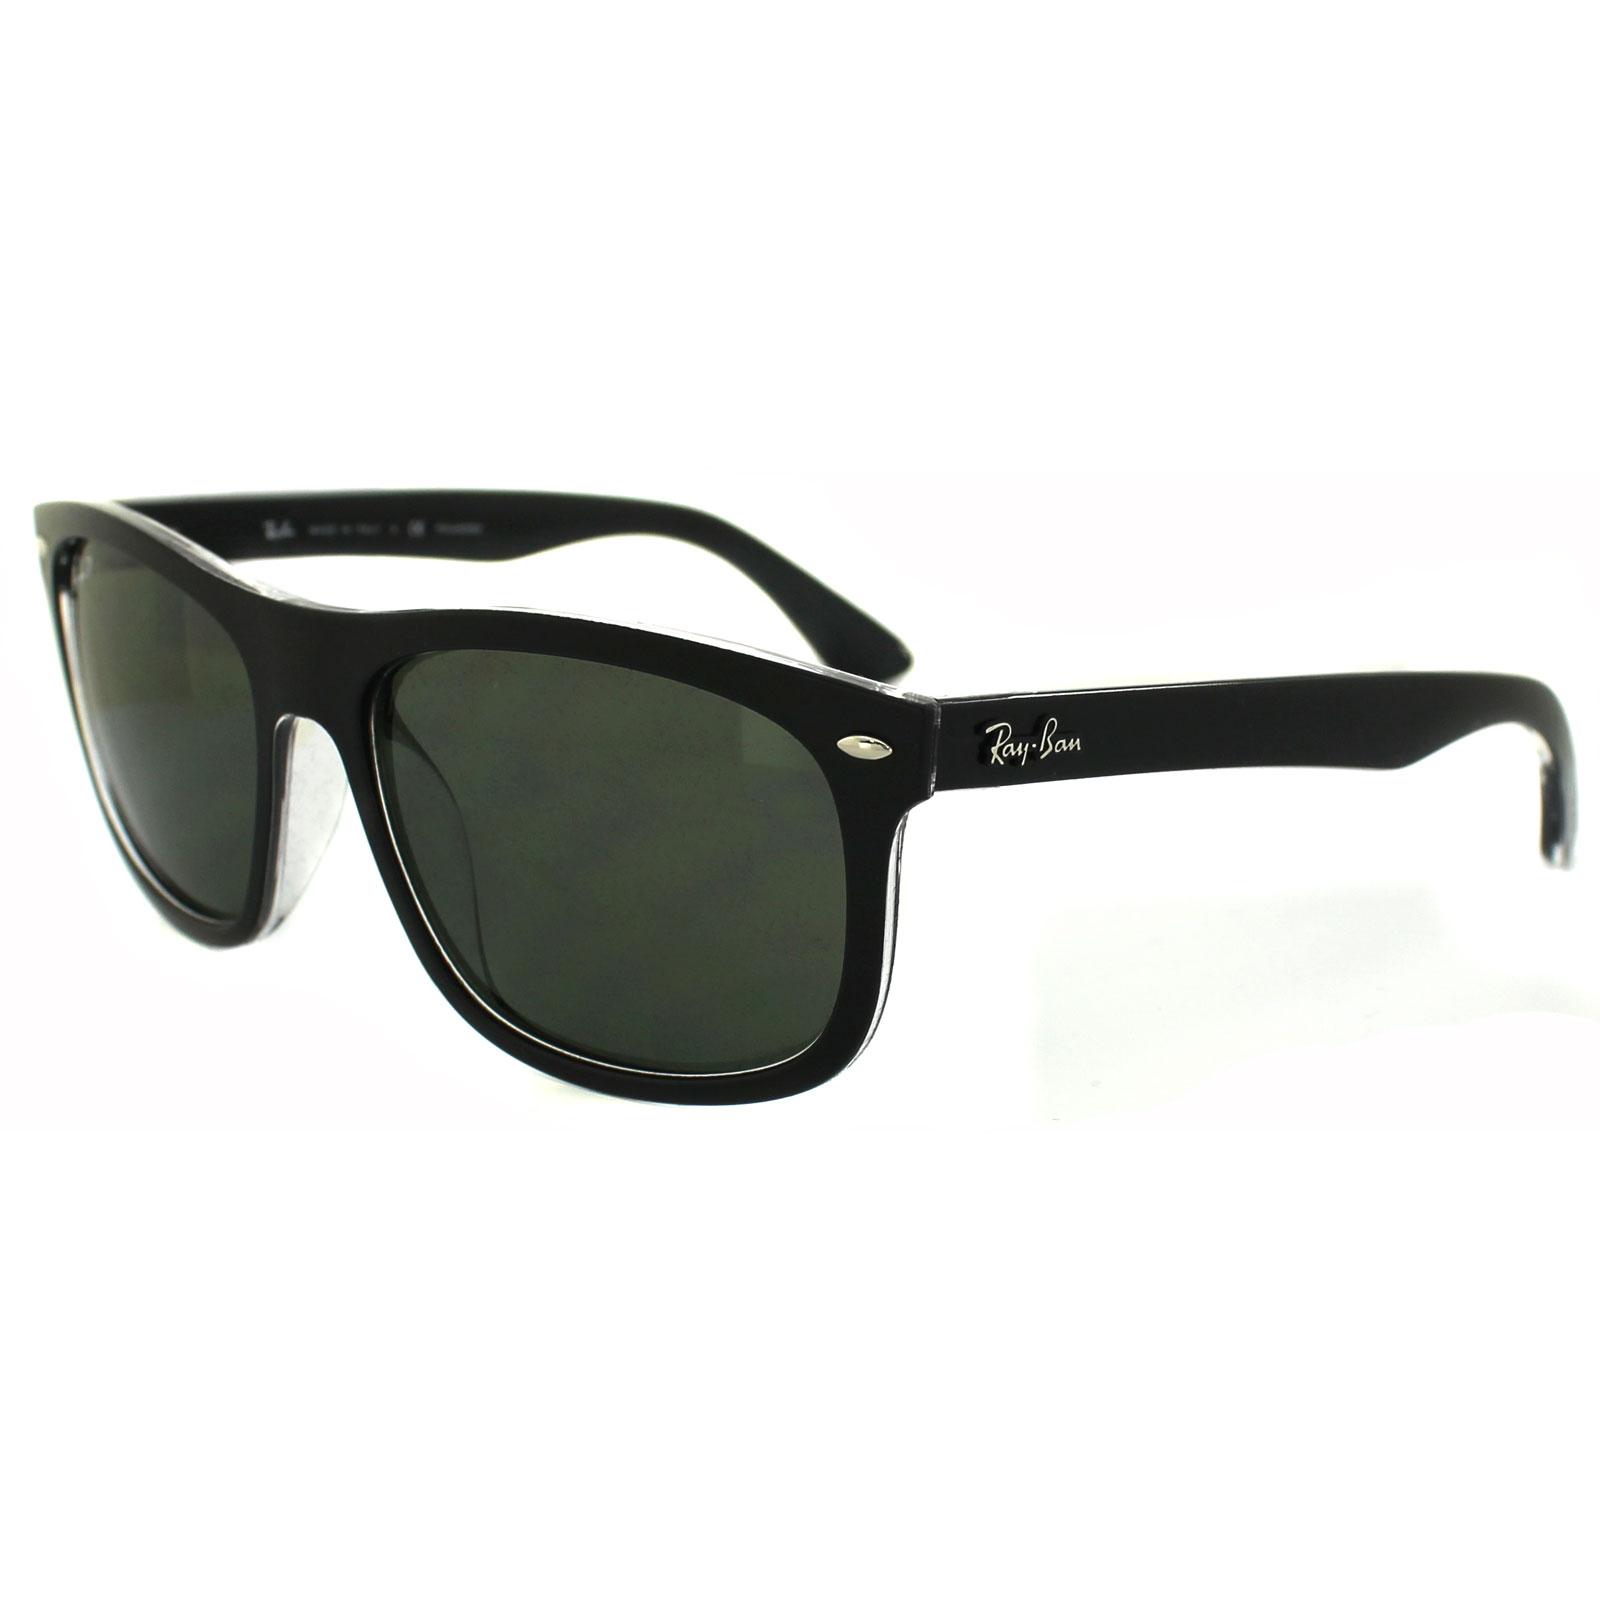 7eaad92cf8a1b Ray-Ban Sunglasses 4226 60529A Black Green Polarized 8053672453959 ...